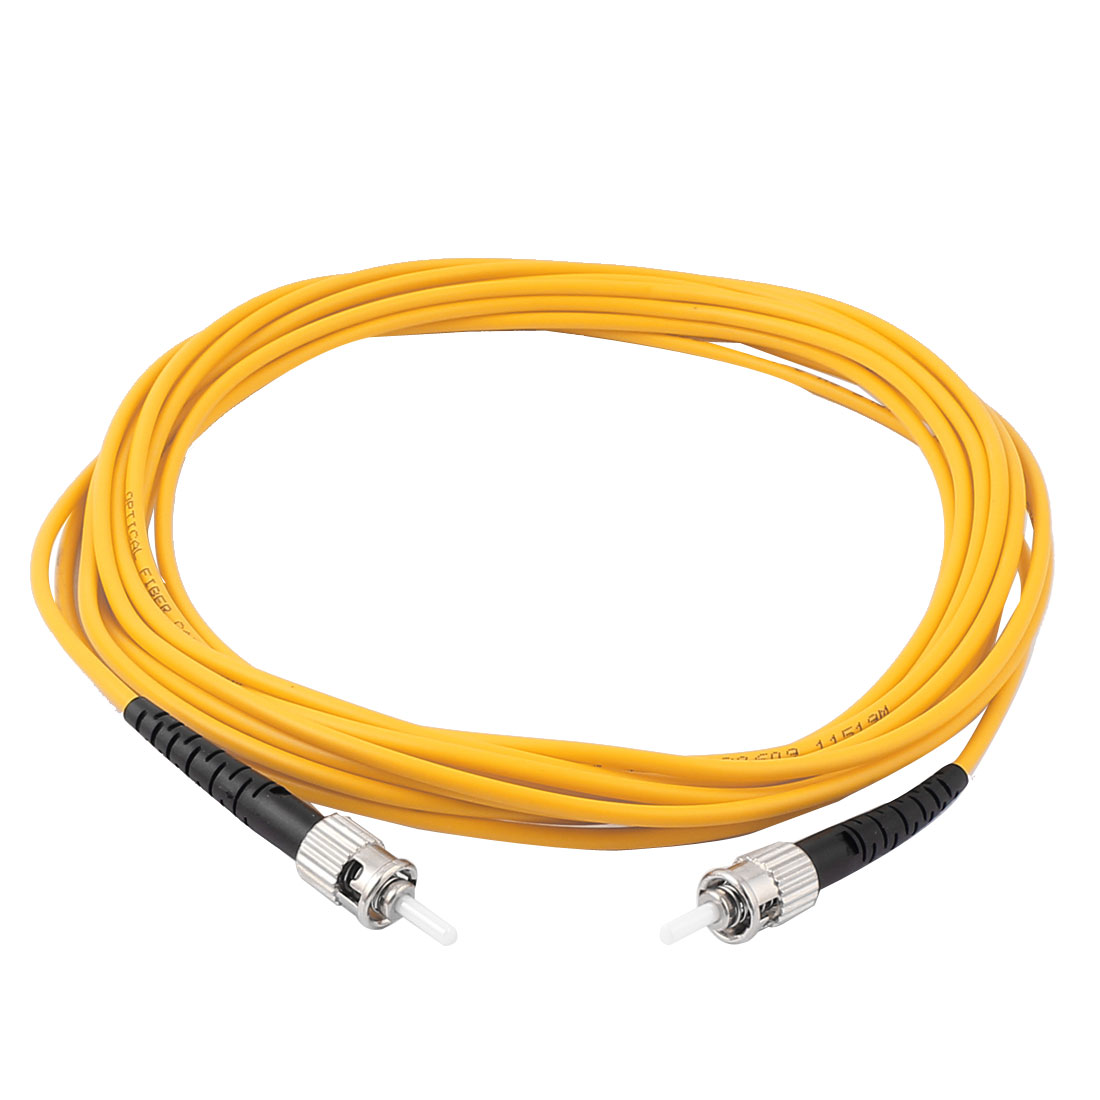 5M 16.4Ft Jumper Cable Simplex Singlemode ST-ST Fiber Optic Patch Cord